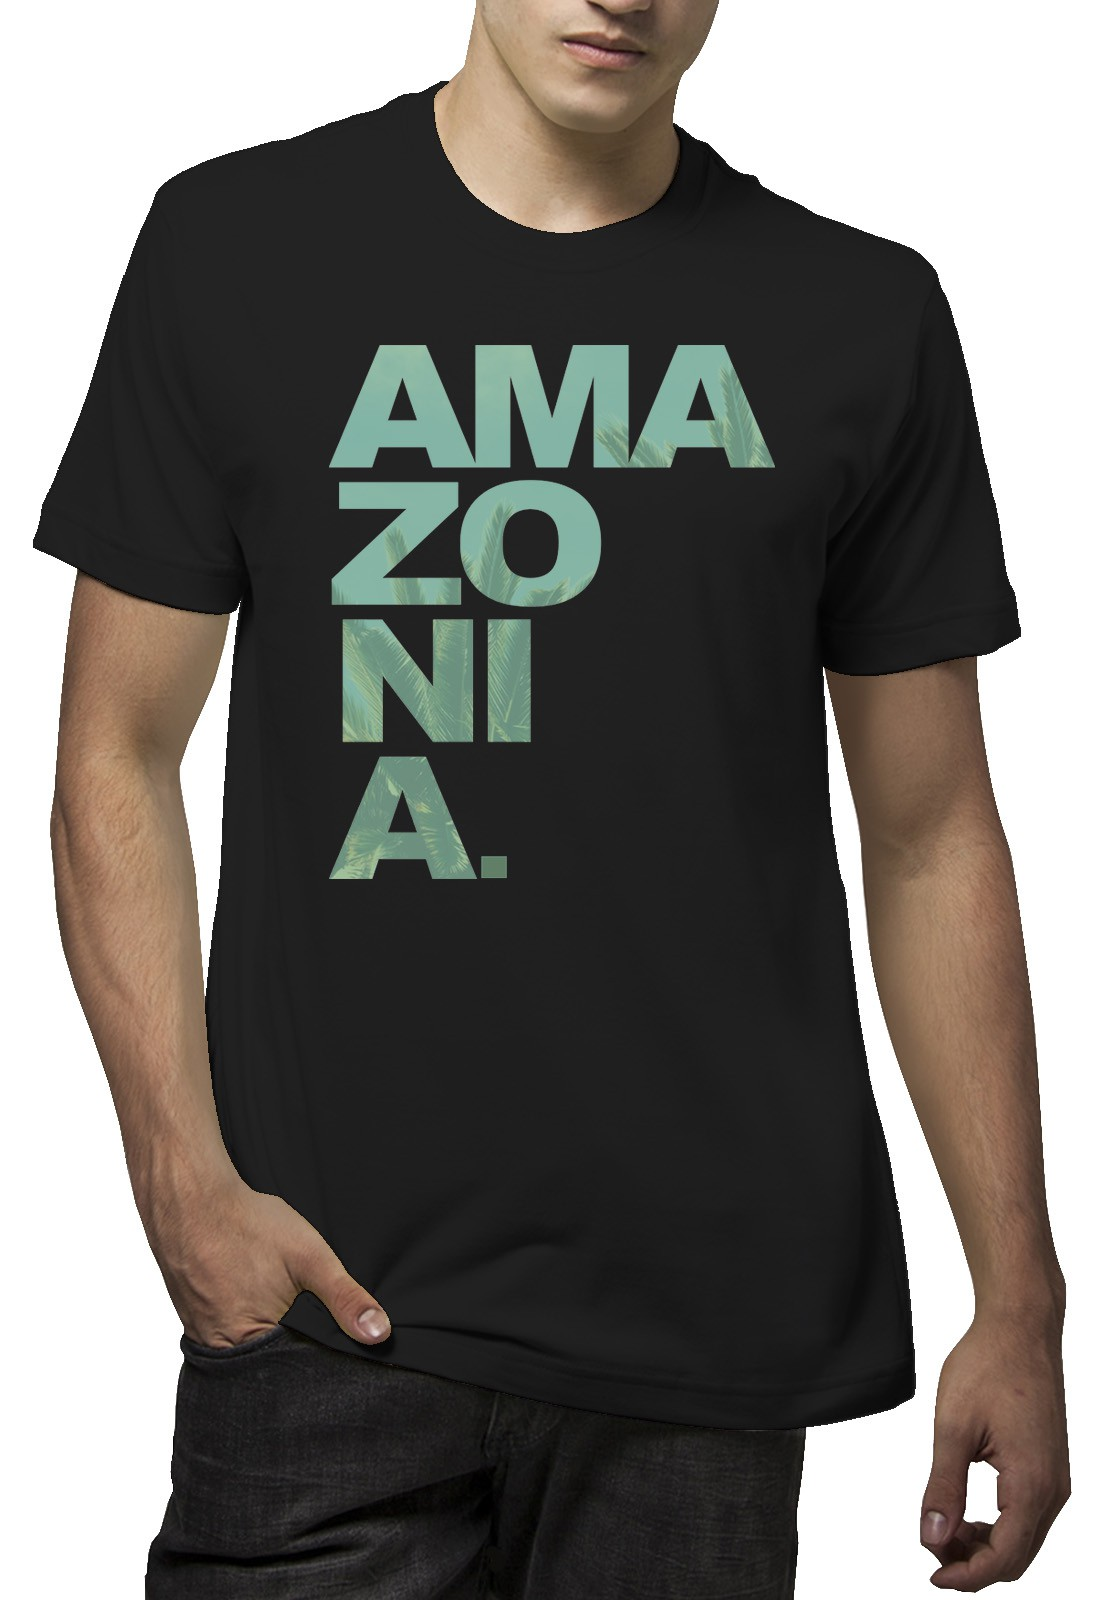 Camiseta Amazônia Ama zo ni a - Preto